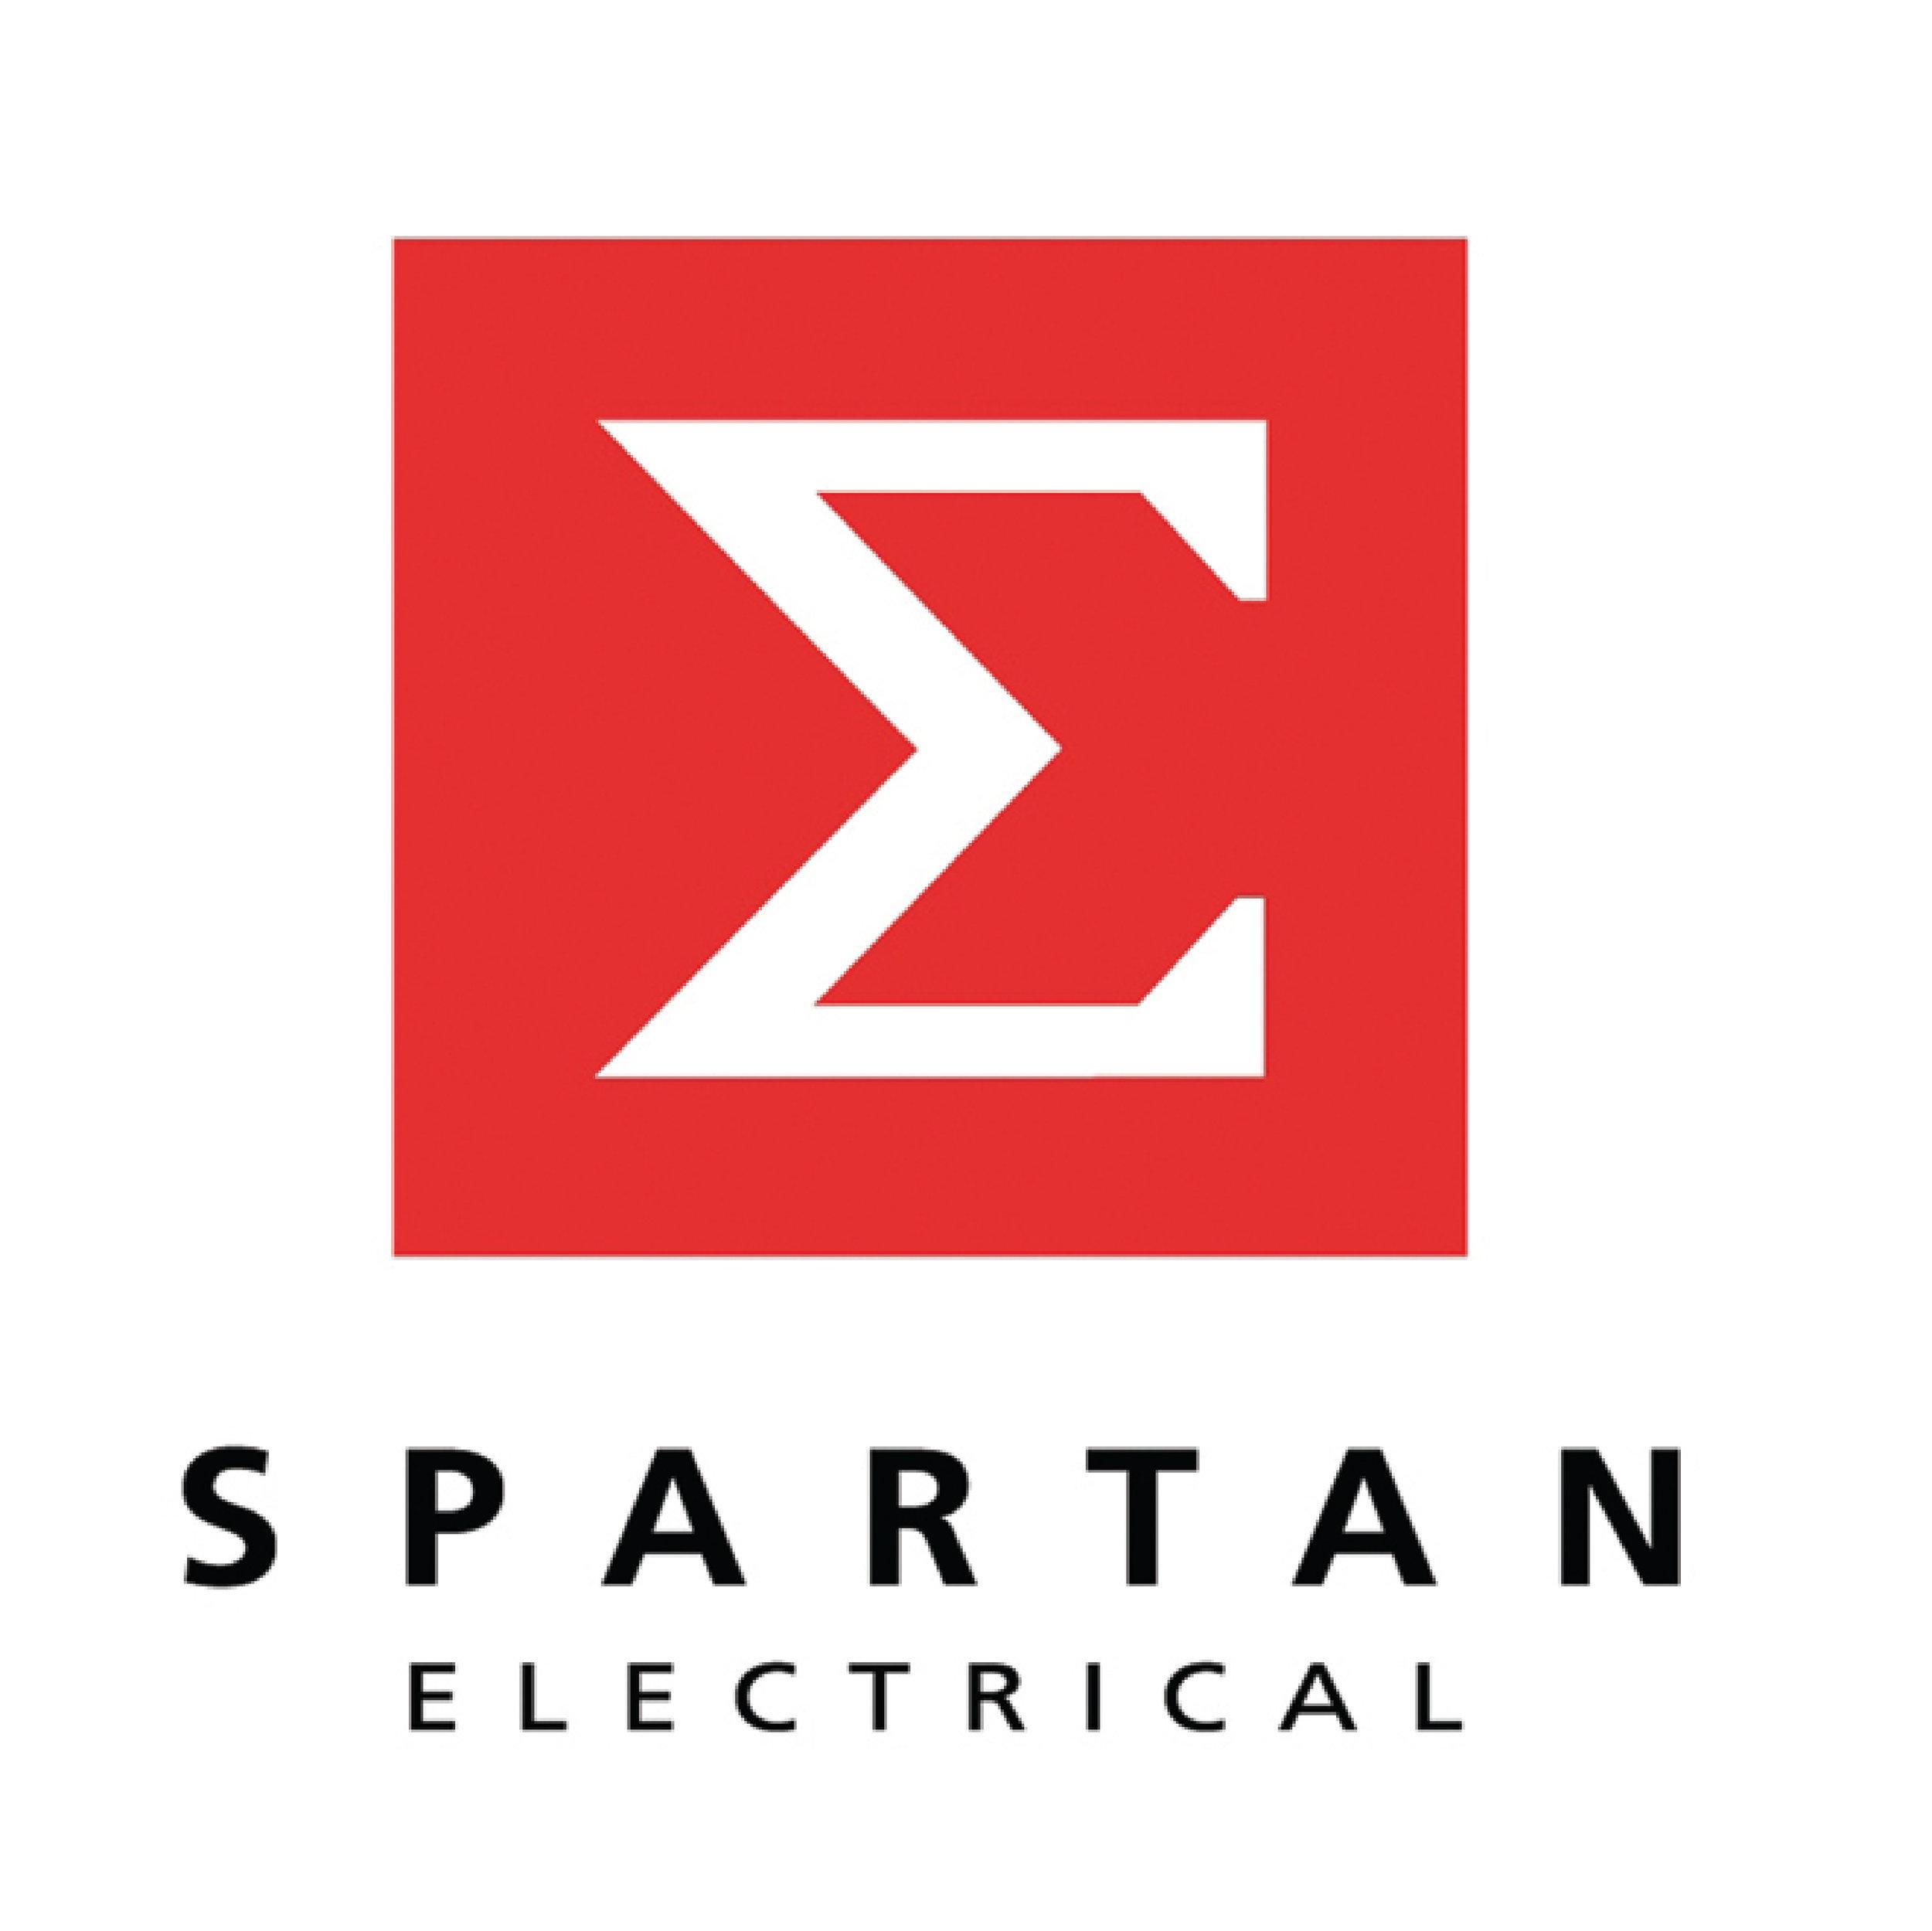 Spartan Electrical - vertical Logo-01.jpg